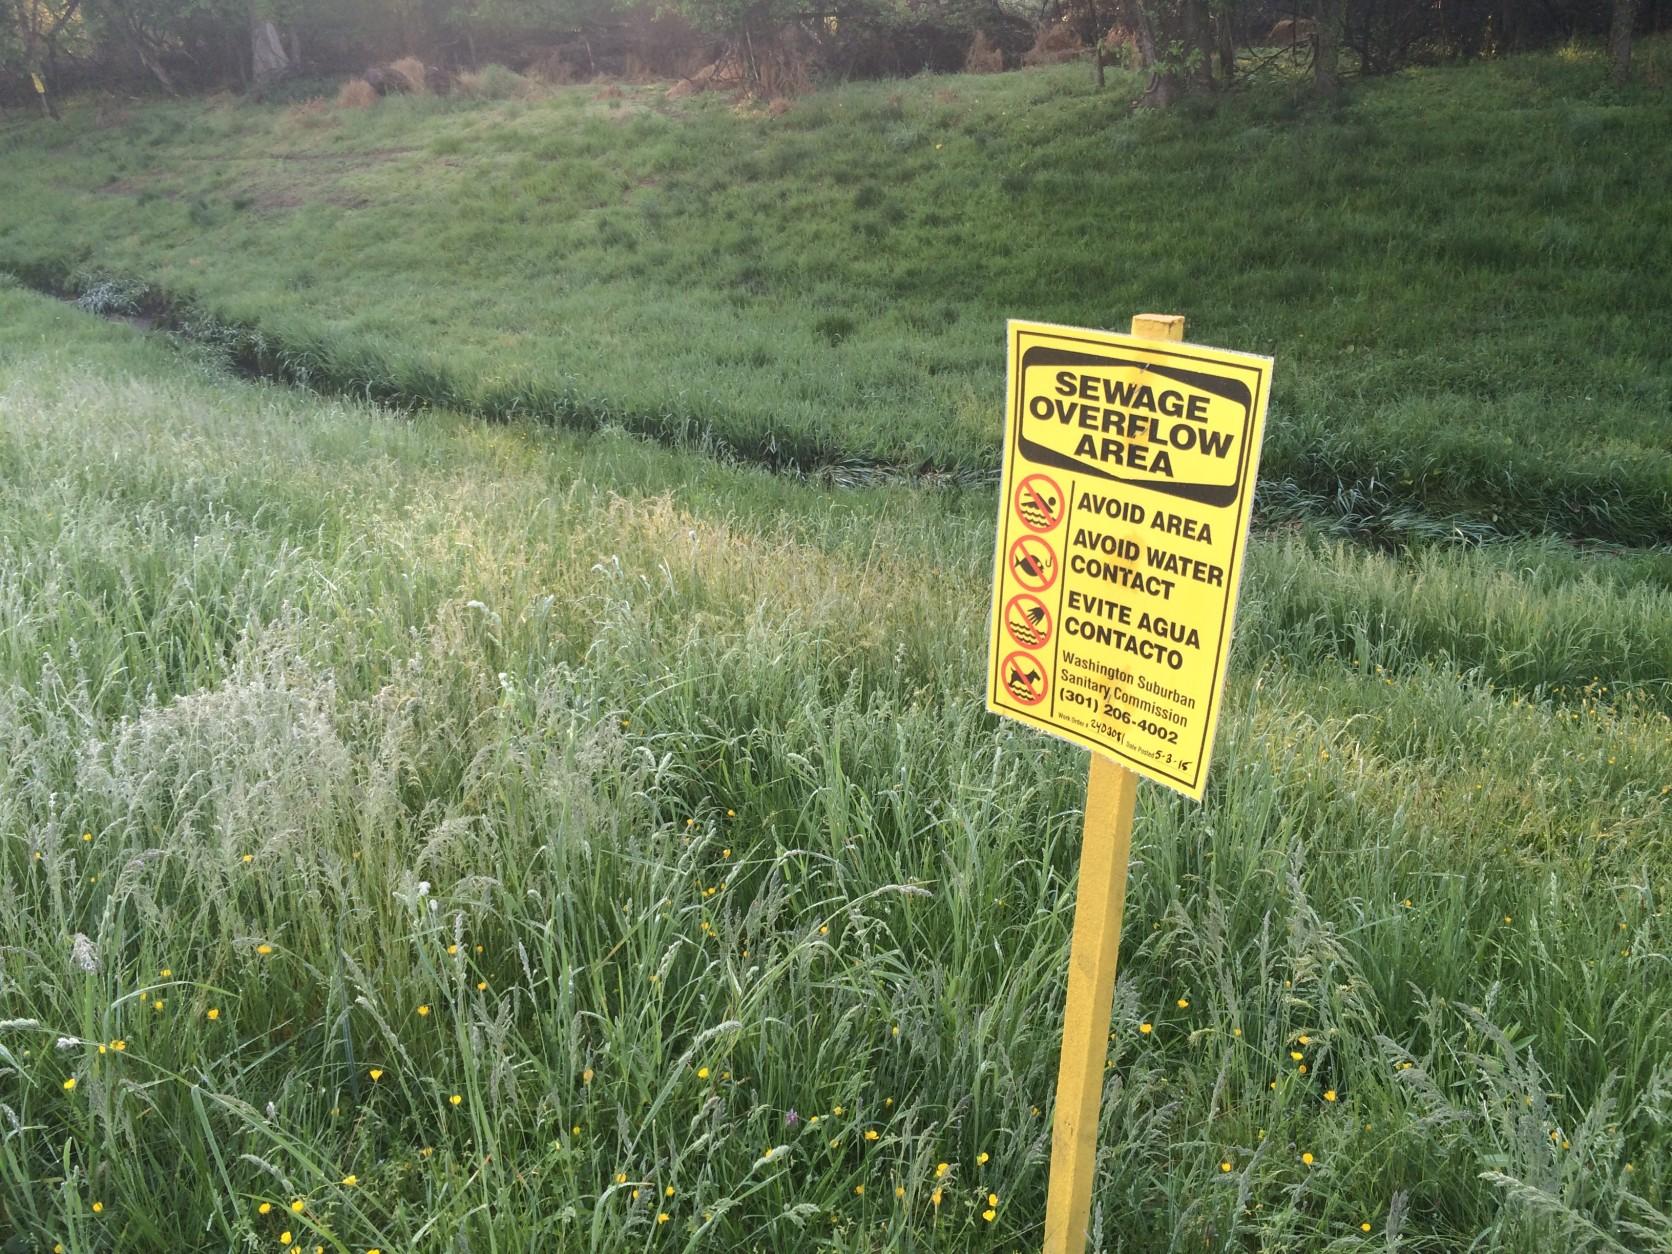 Sewage X Pg County Shutting Off Water